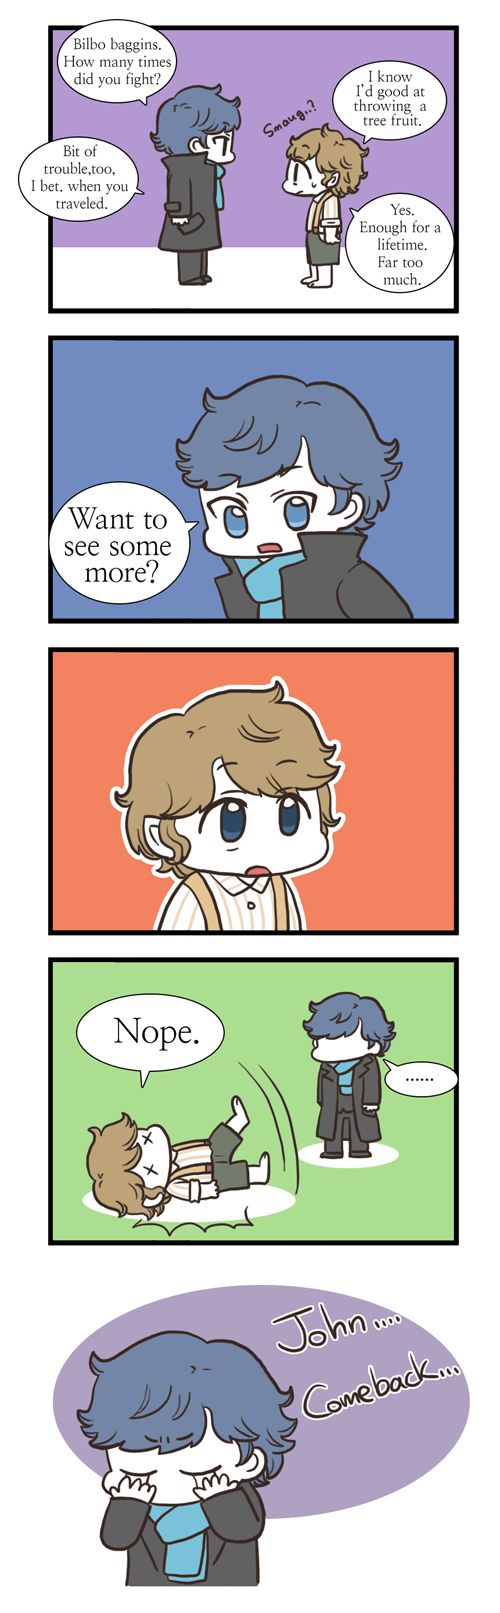 Sherlock and The Hobbit crossover Sherlock meet Bilbo, Bilbo meet Sherlock